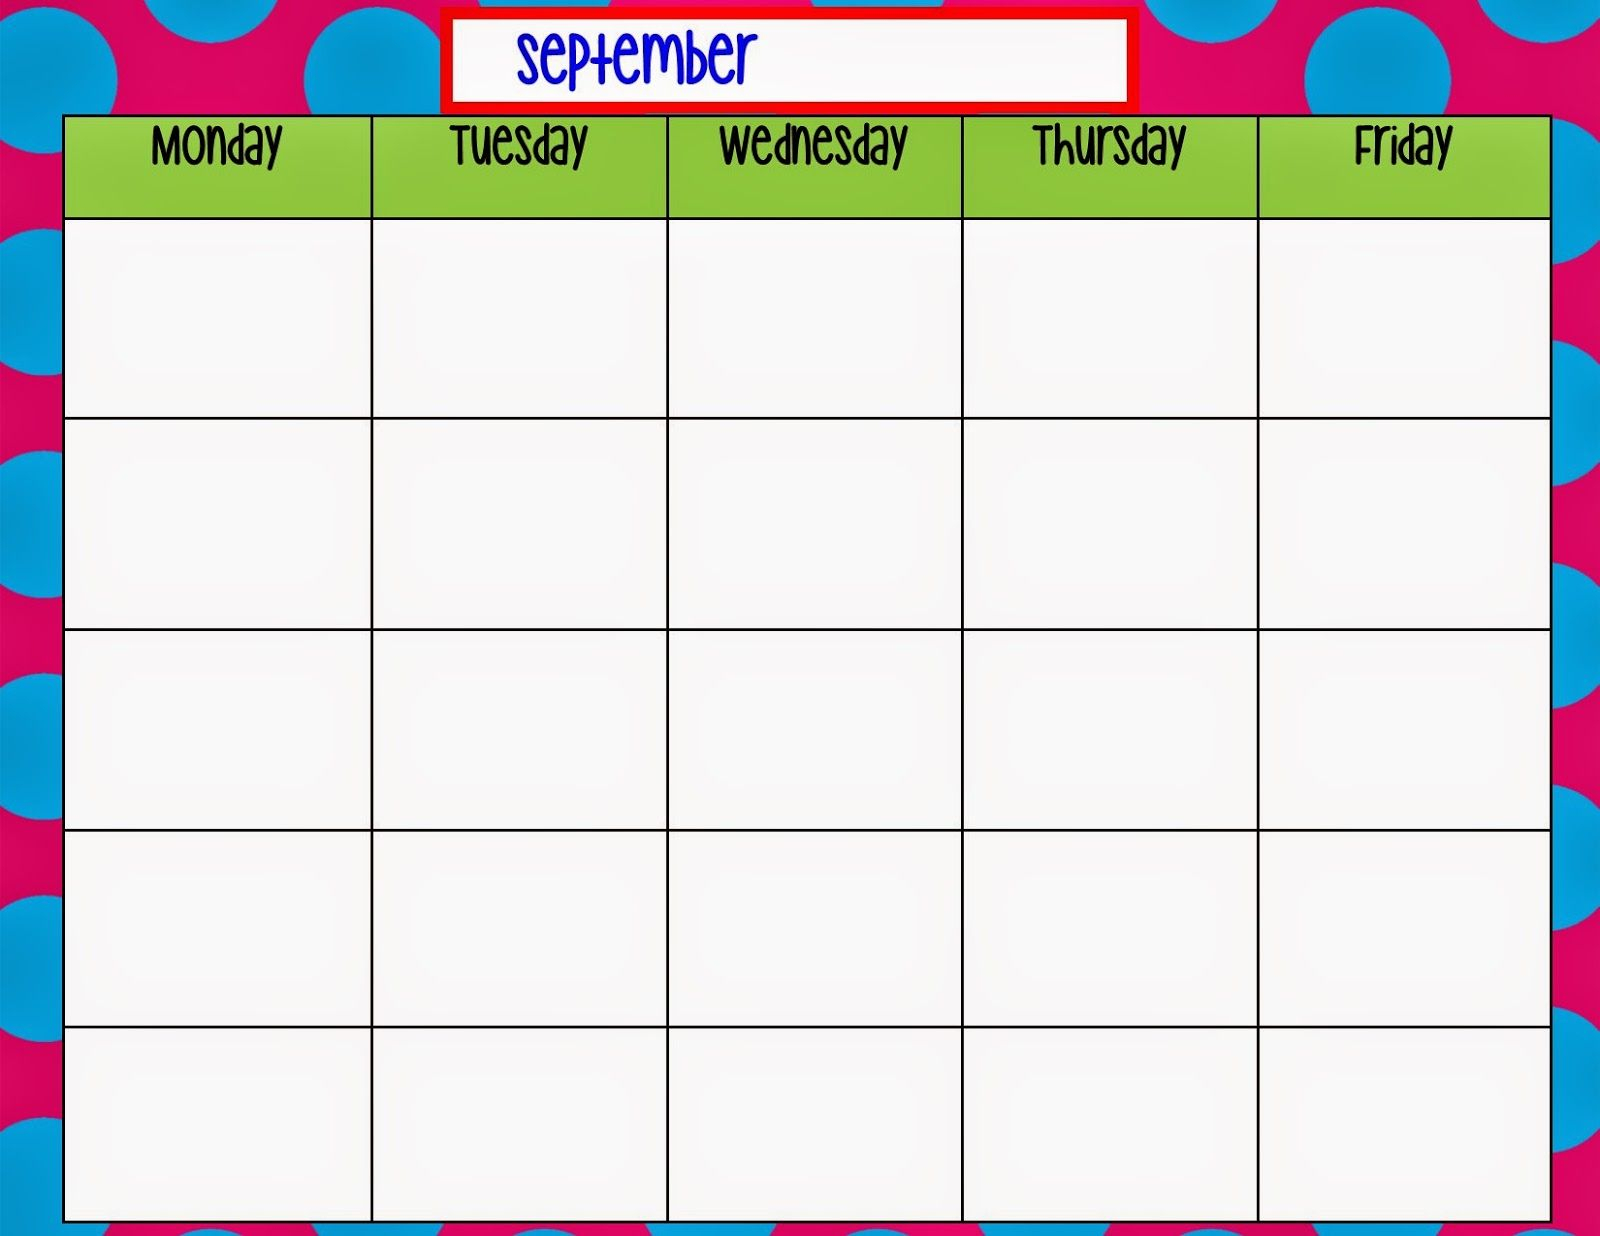 Monday Through Friday Calendar Template | Weekly Calendar inside Monday Through Sunday Calendar Template